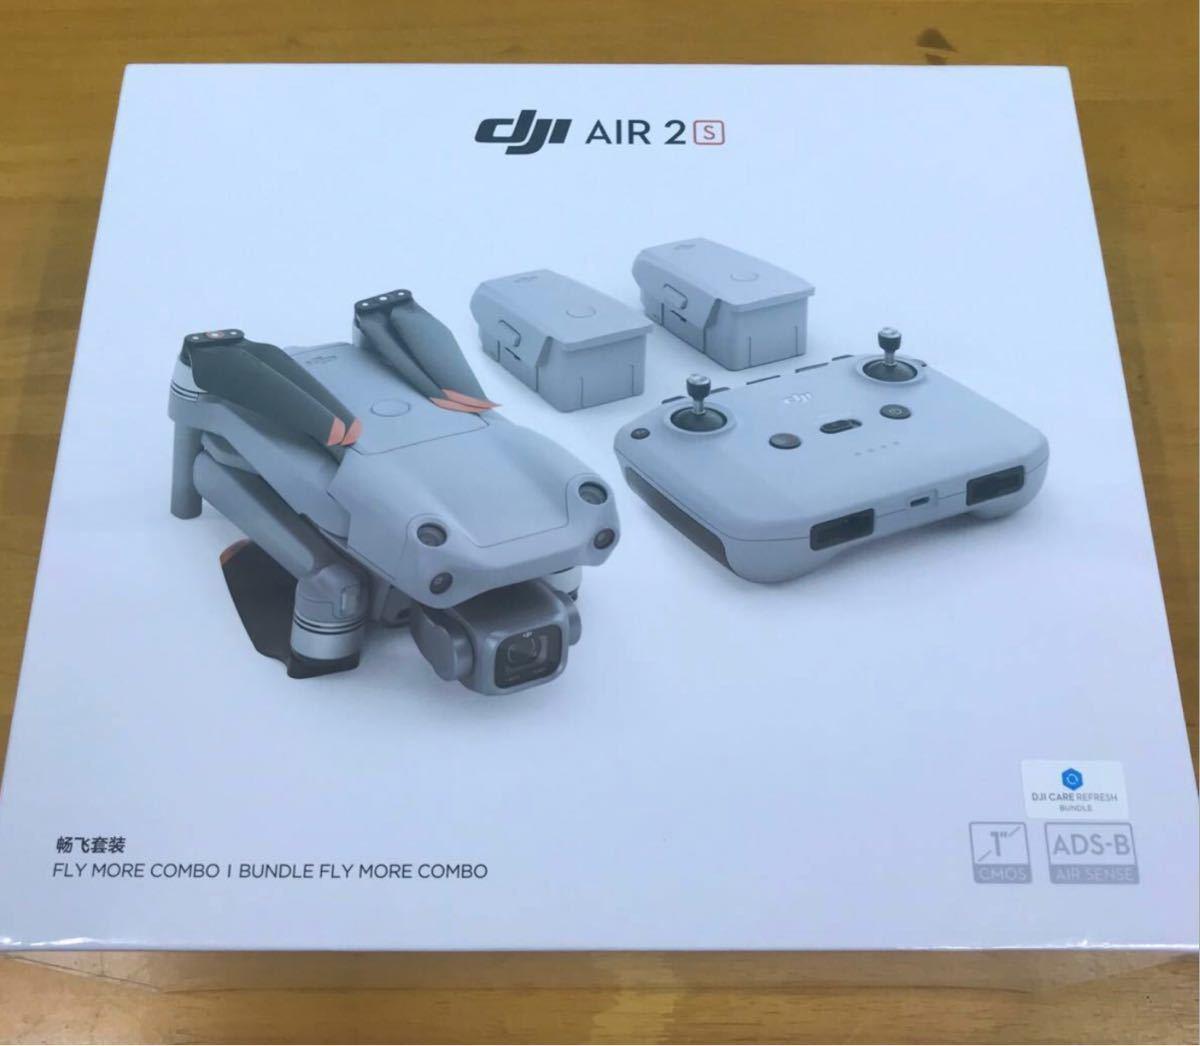 DJI AIR2S フライモアコンボ DJI CARE REFRESH 1年付帯 初年度無償賠償保険付帯 国内購入品 新品未開封